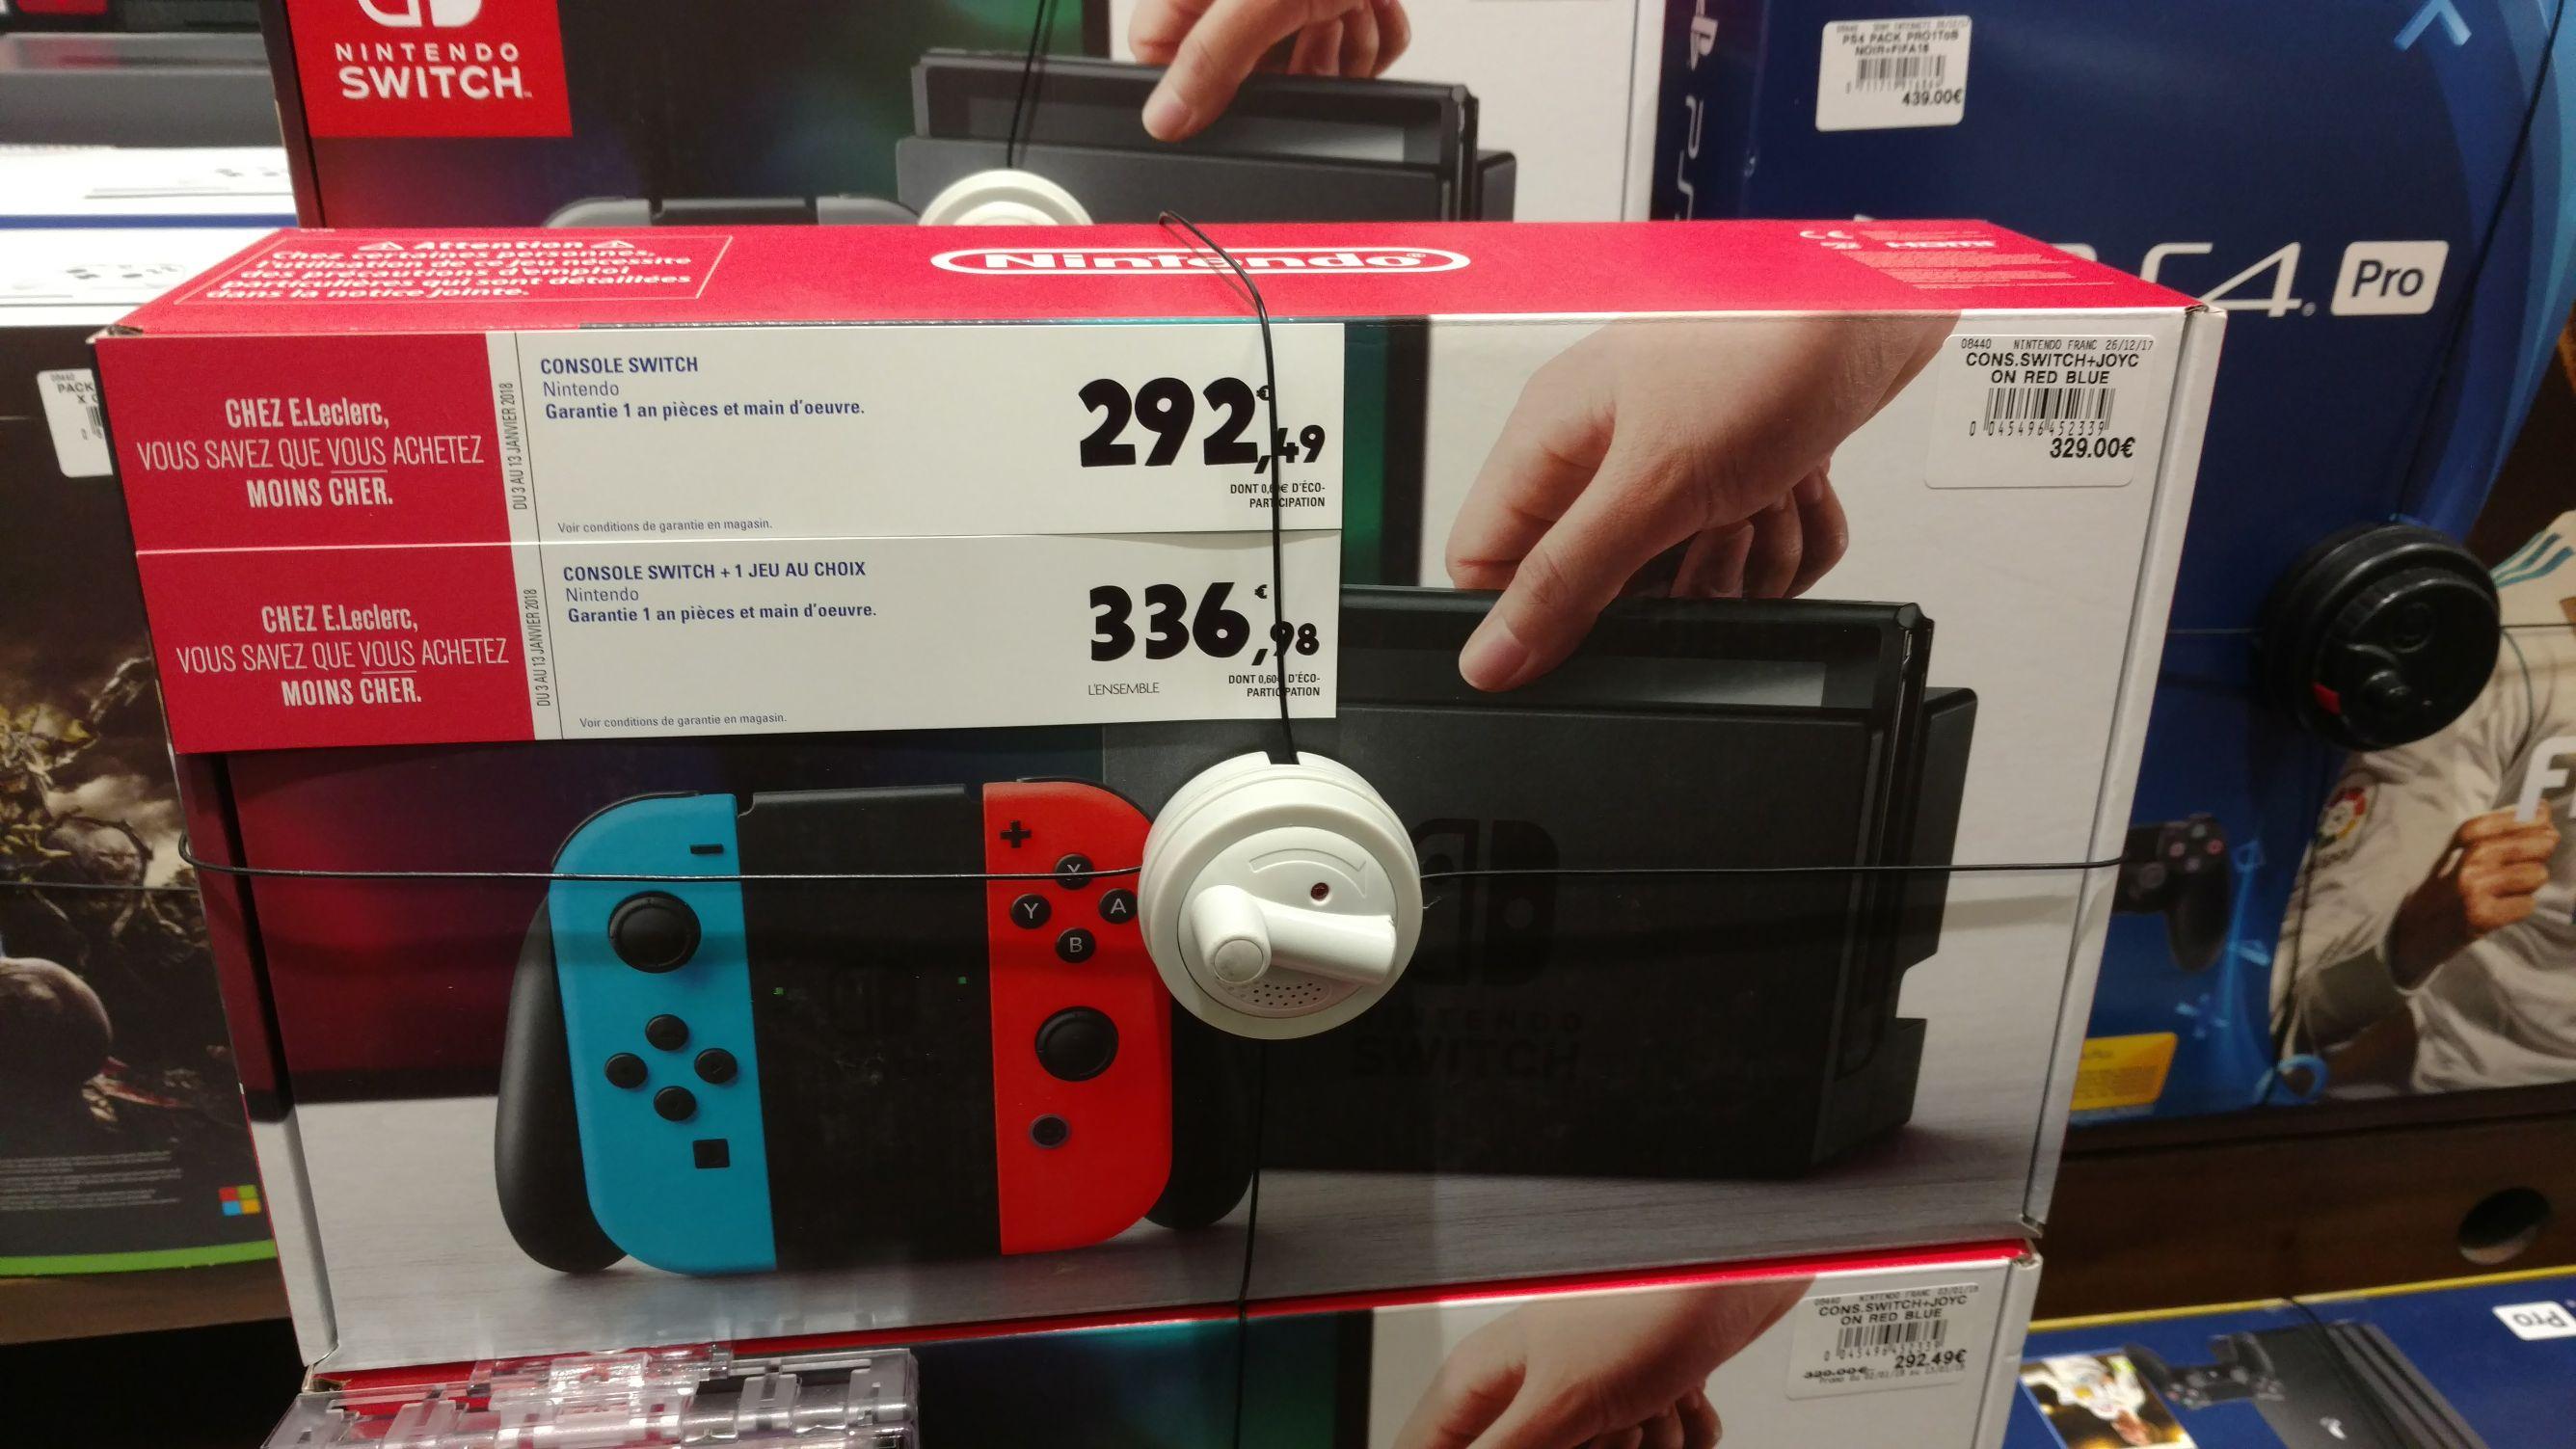 Console Nintendo switch  - E.leclerc Pontivy (56)